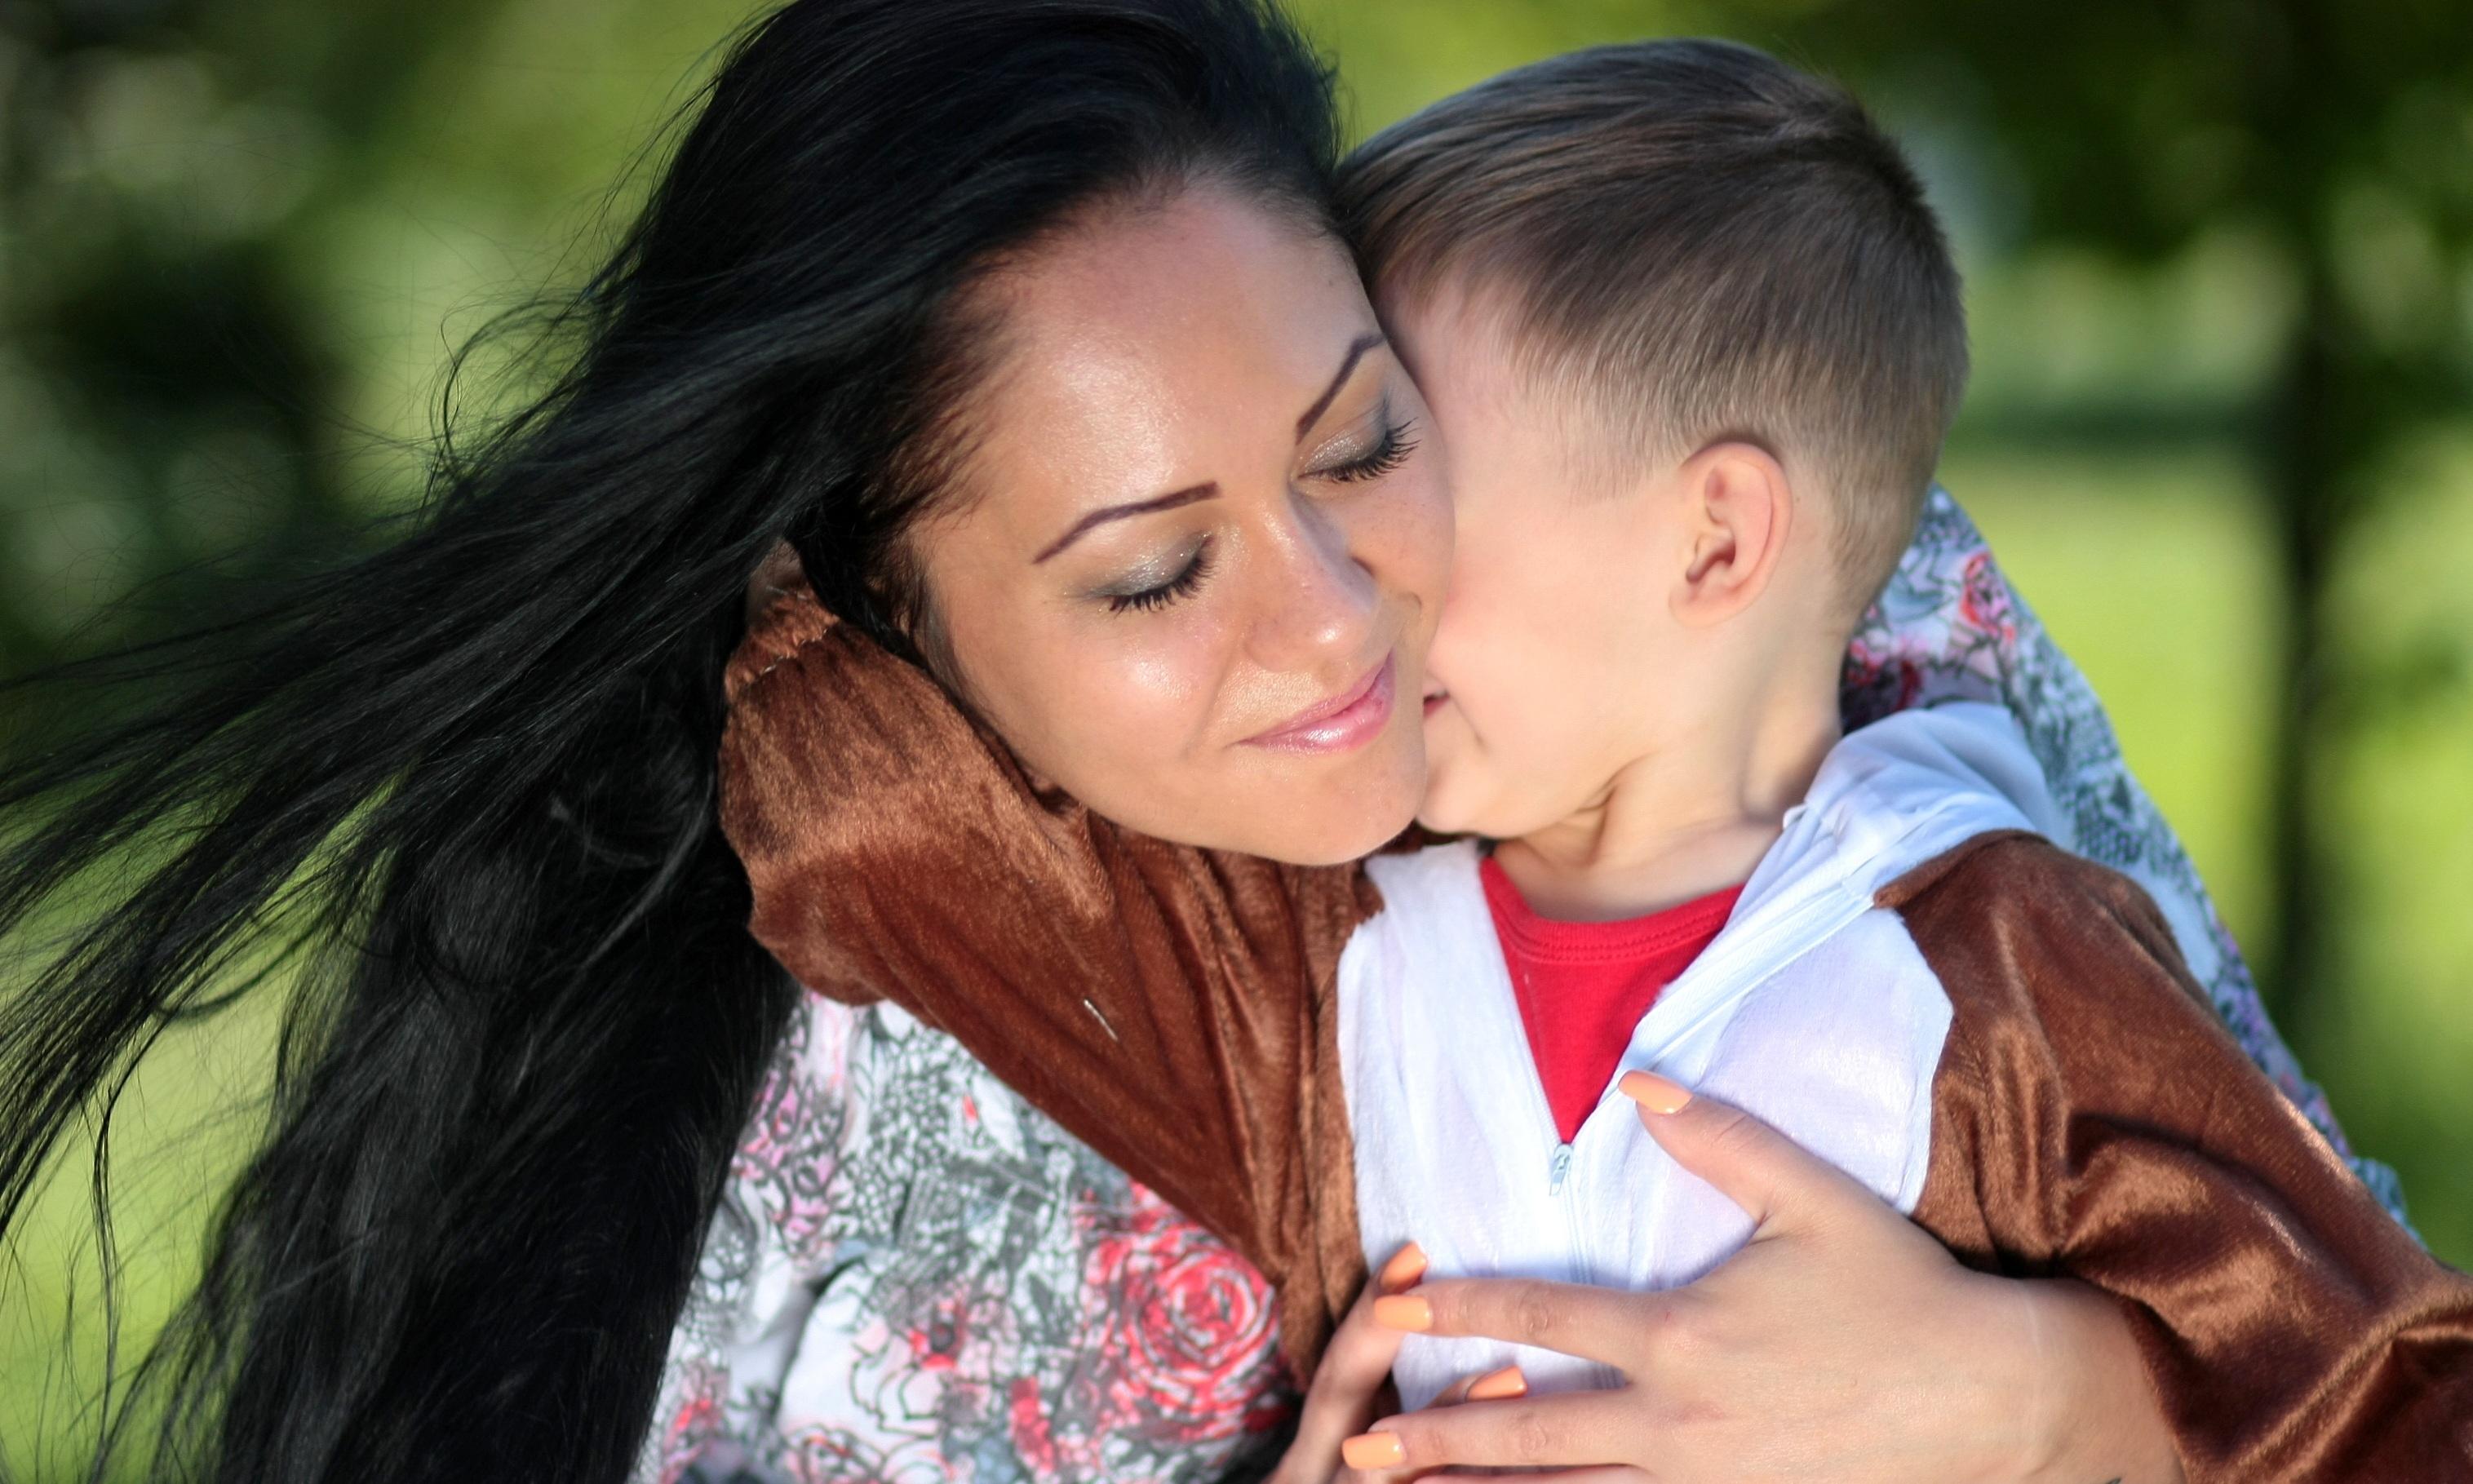 Открытка кардмейкинг, картинки мать с сыном